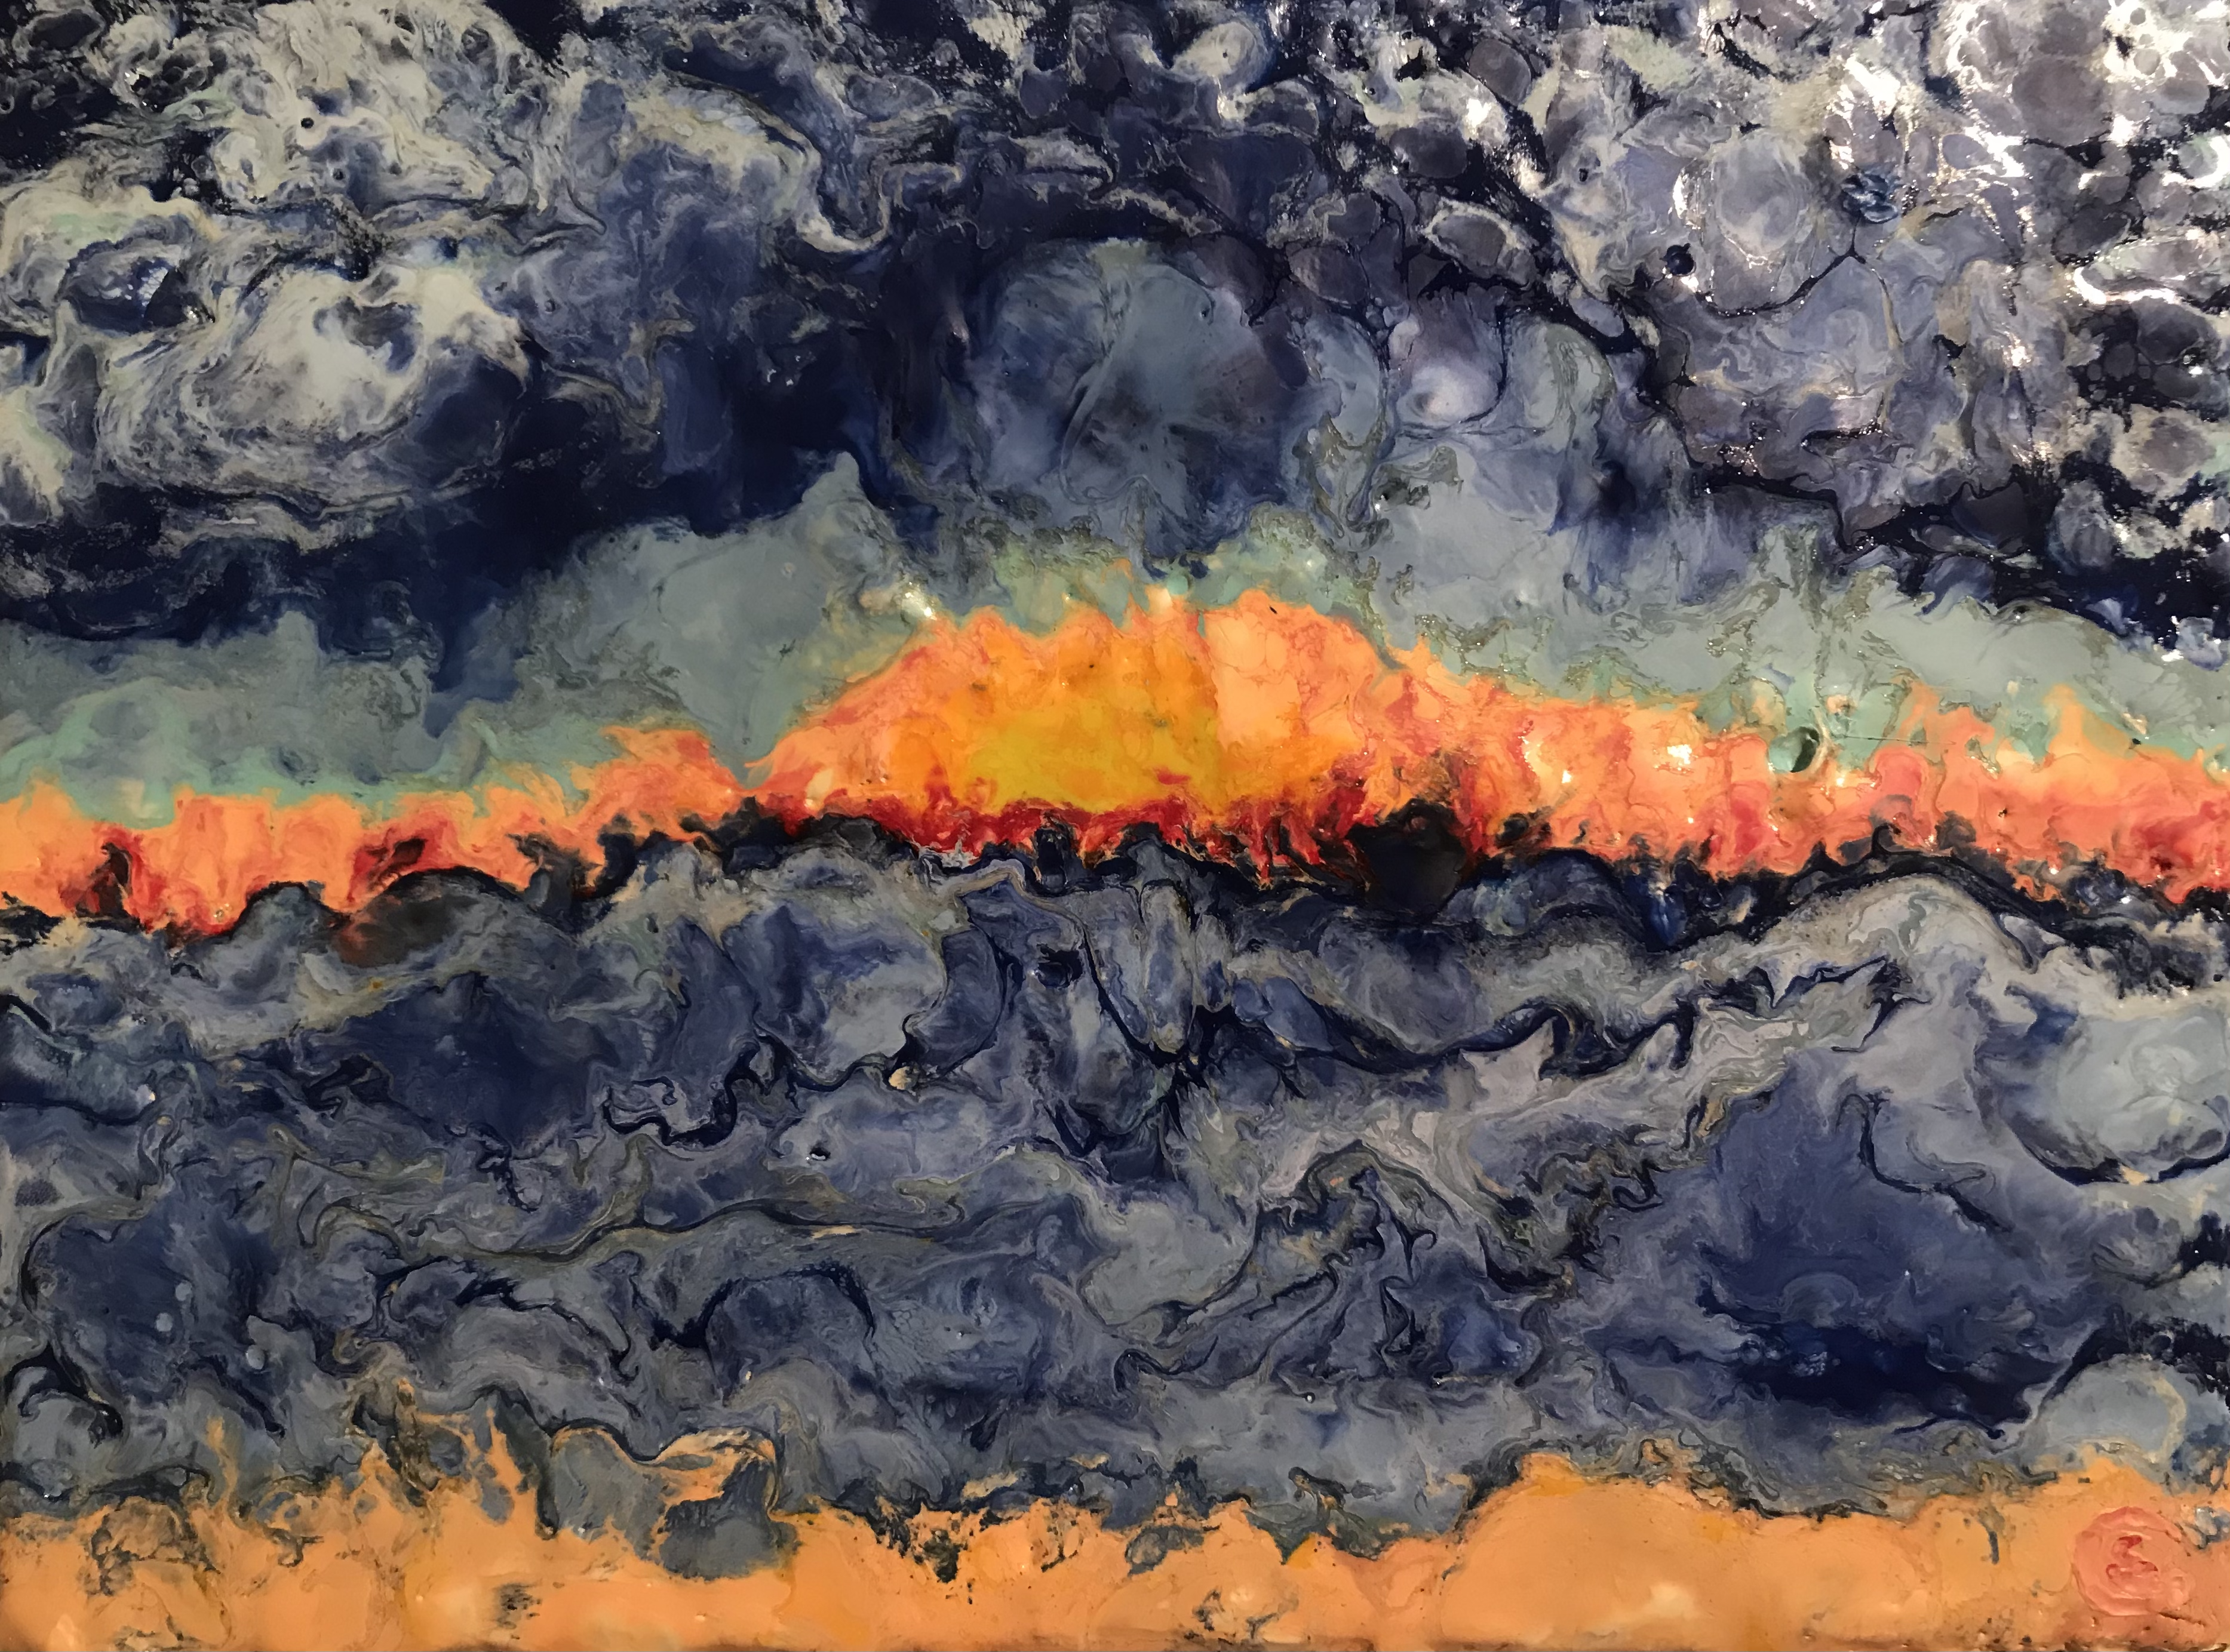 Winter Blues, Encaustic on canvas, 17.5x24